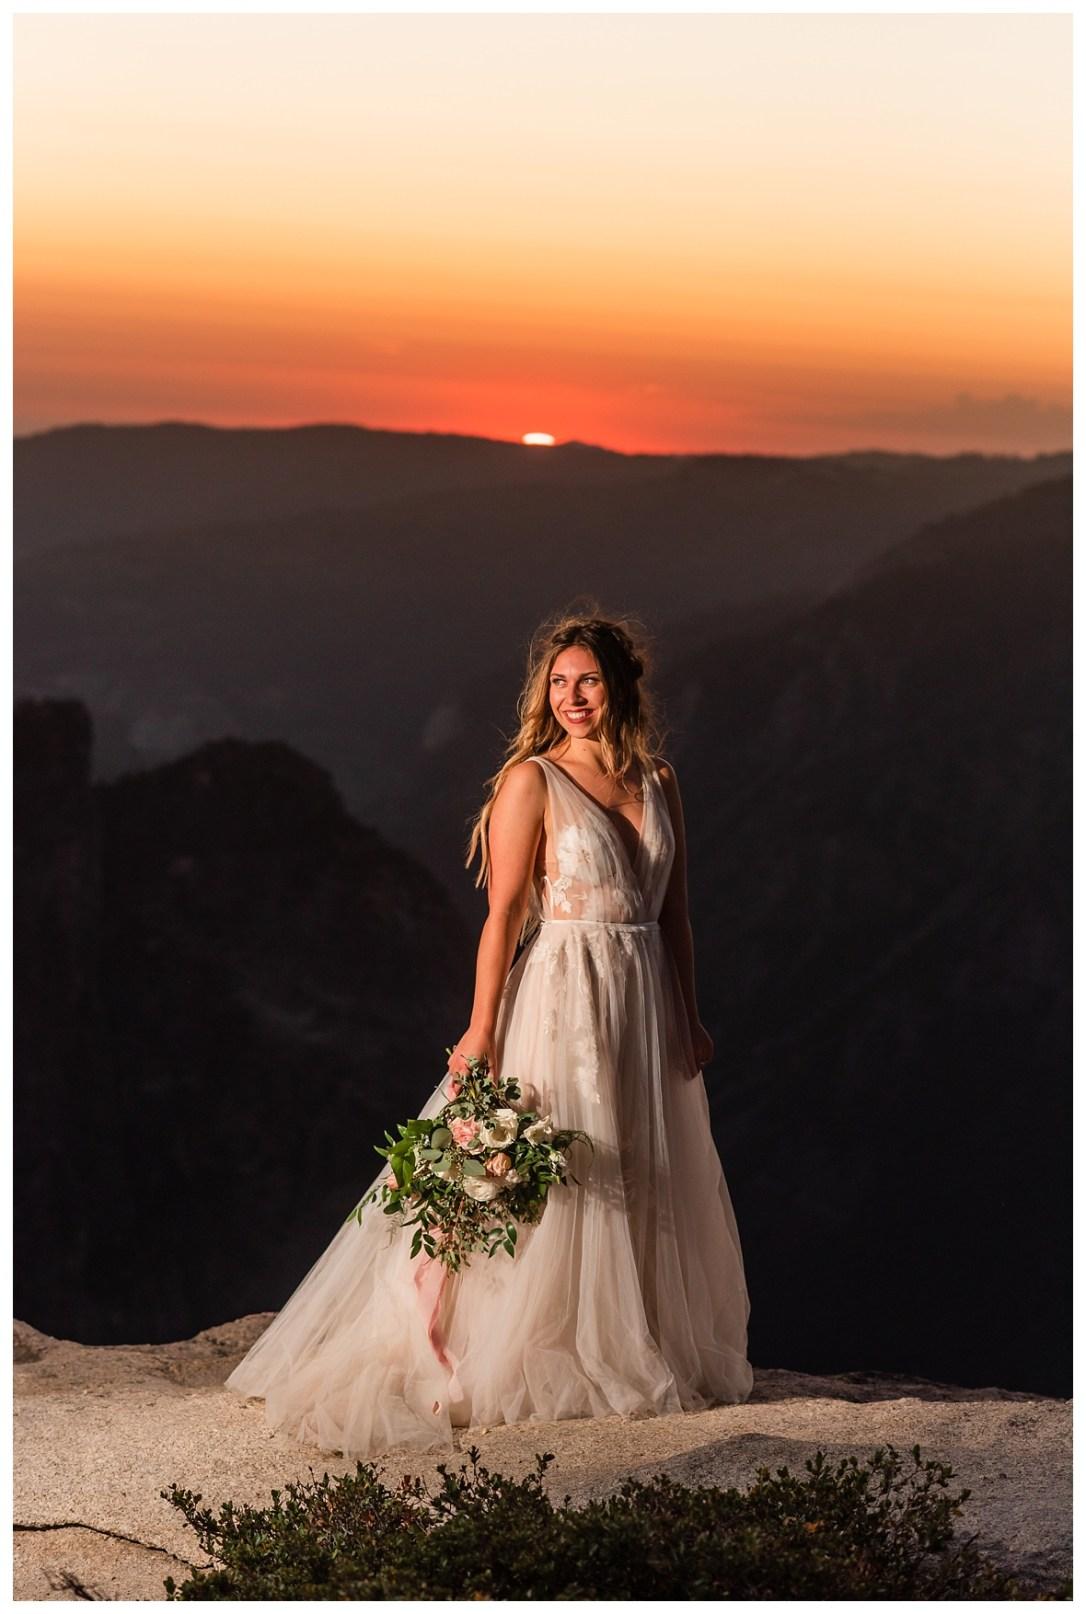 Boho bride at sunset